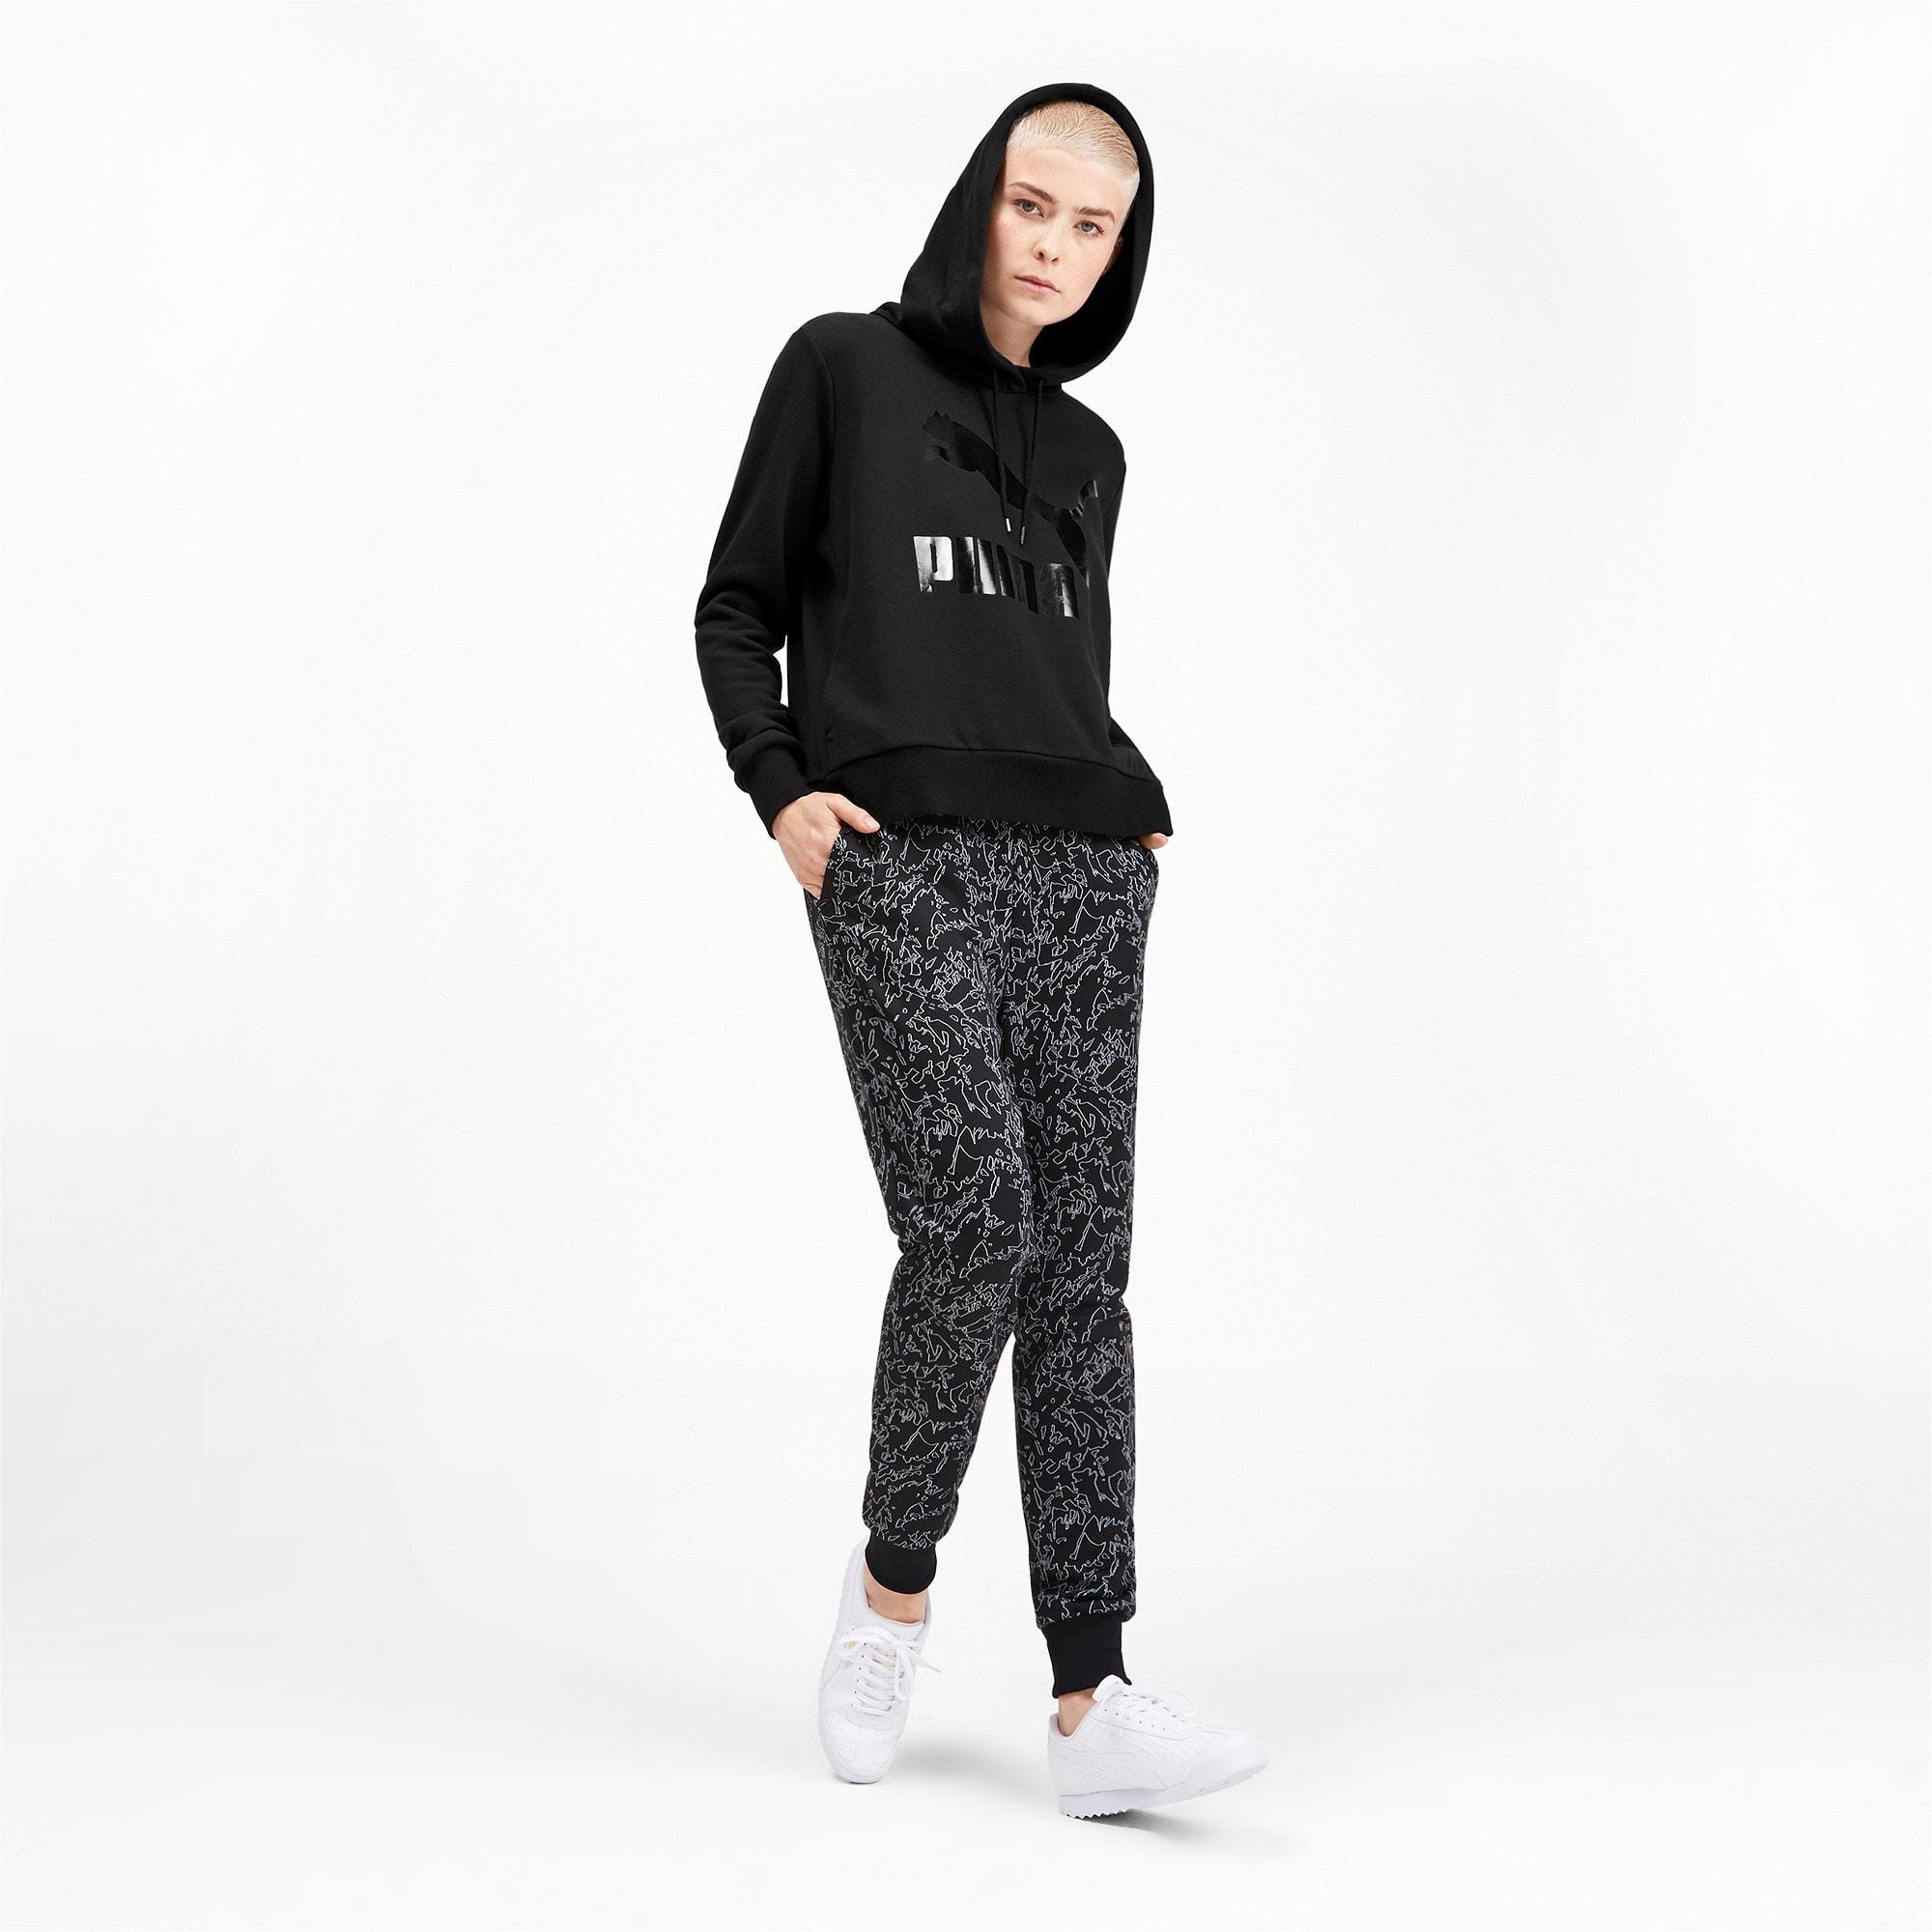 Thumbnail 4 of Classics Logo hoodie voor dames, Puma Black, medium